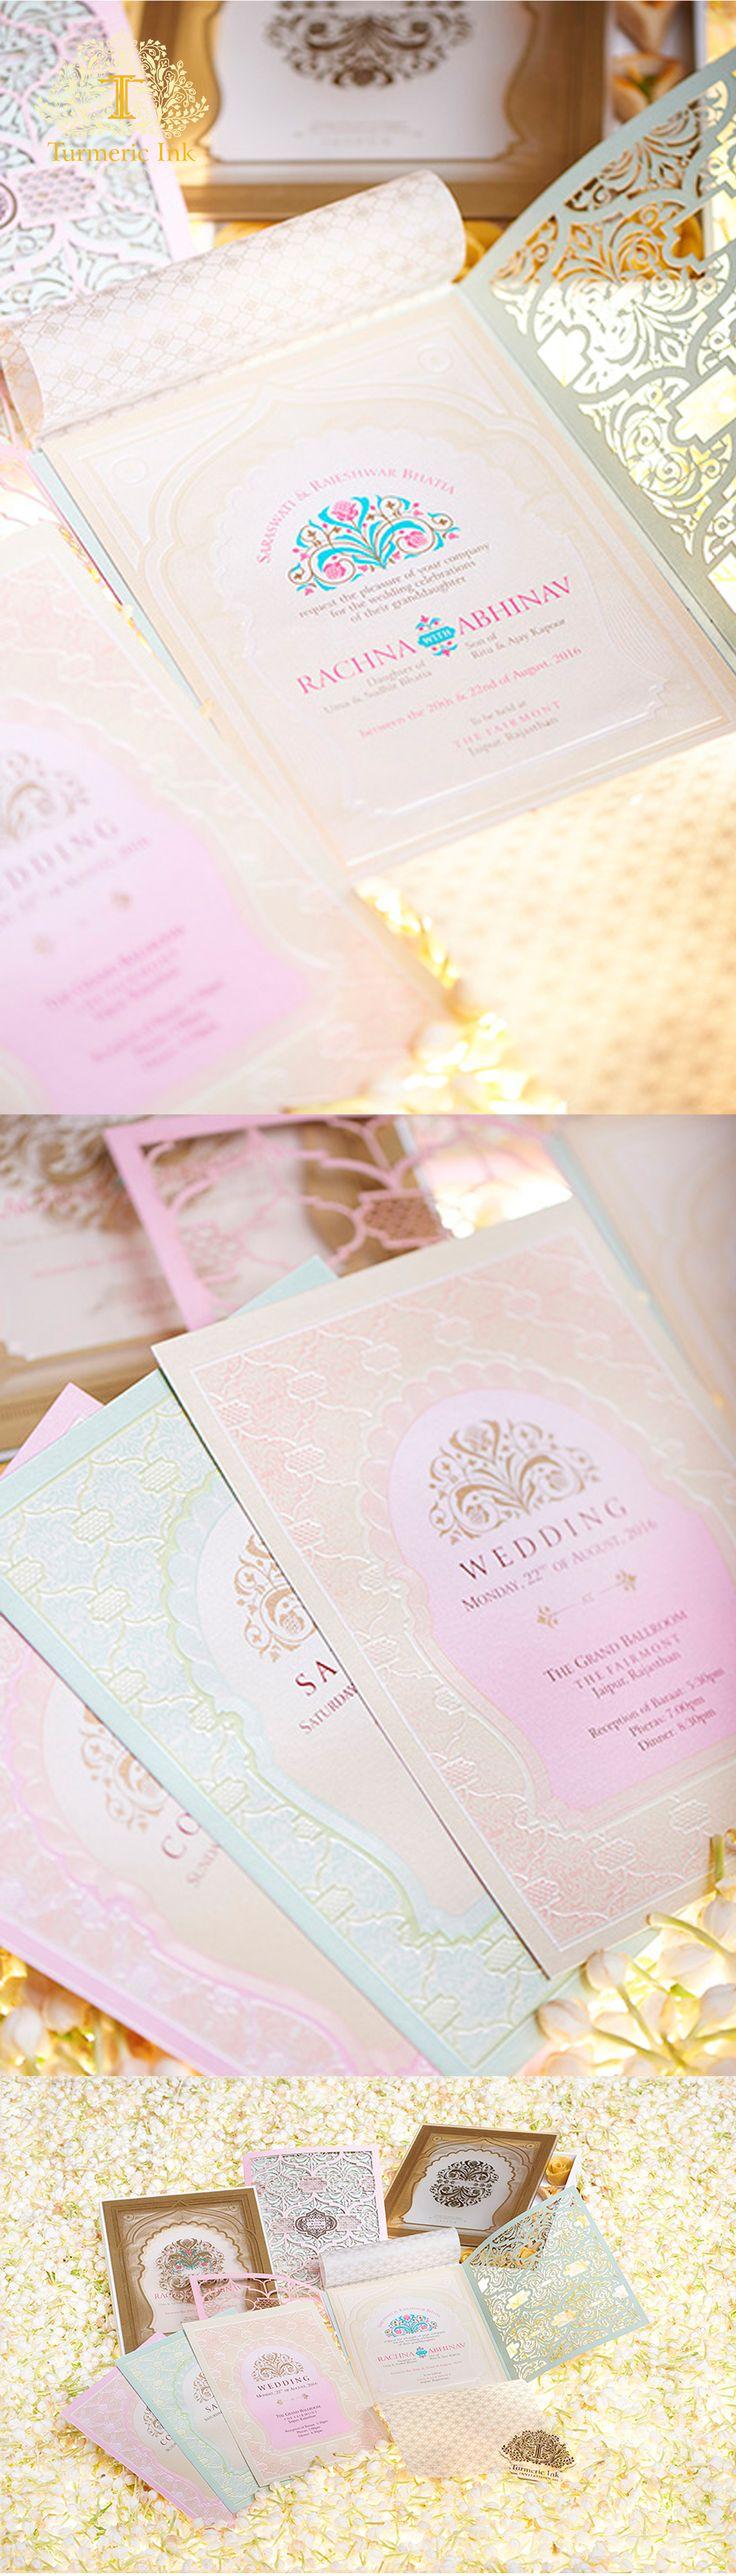 indian wedding invitations california%0A invite  invitations  Indian wedding invite  wedding card  bride  indian  bride